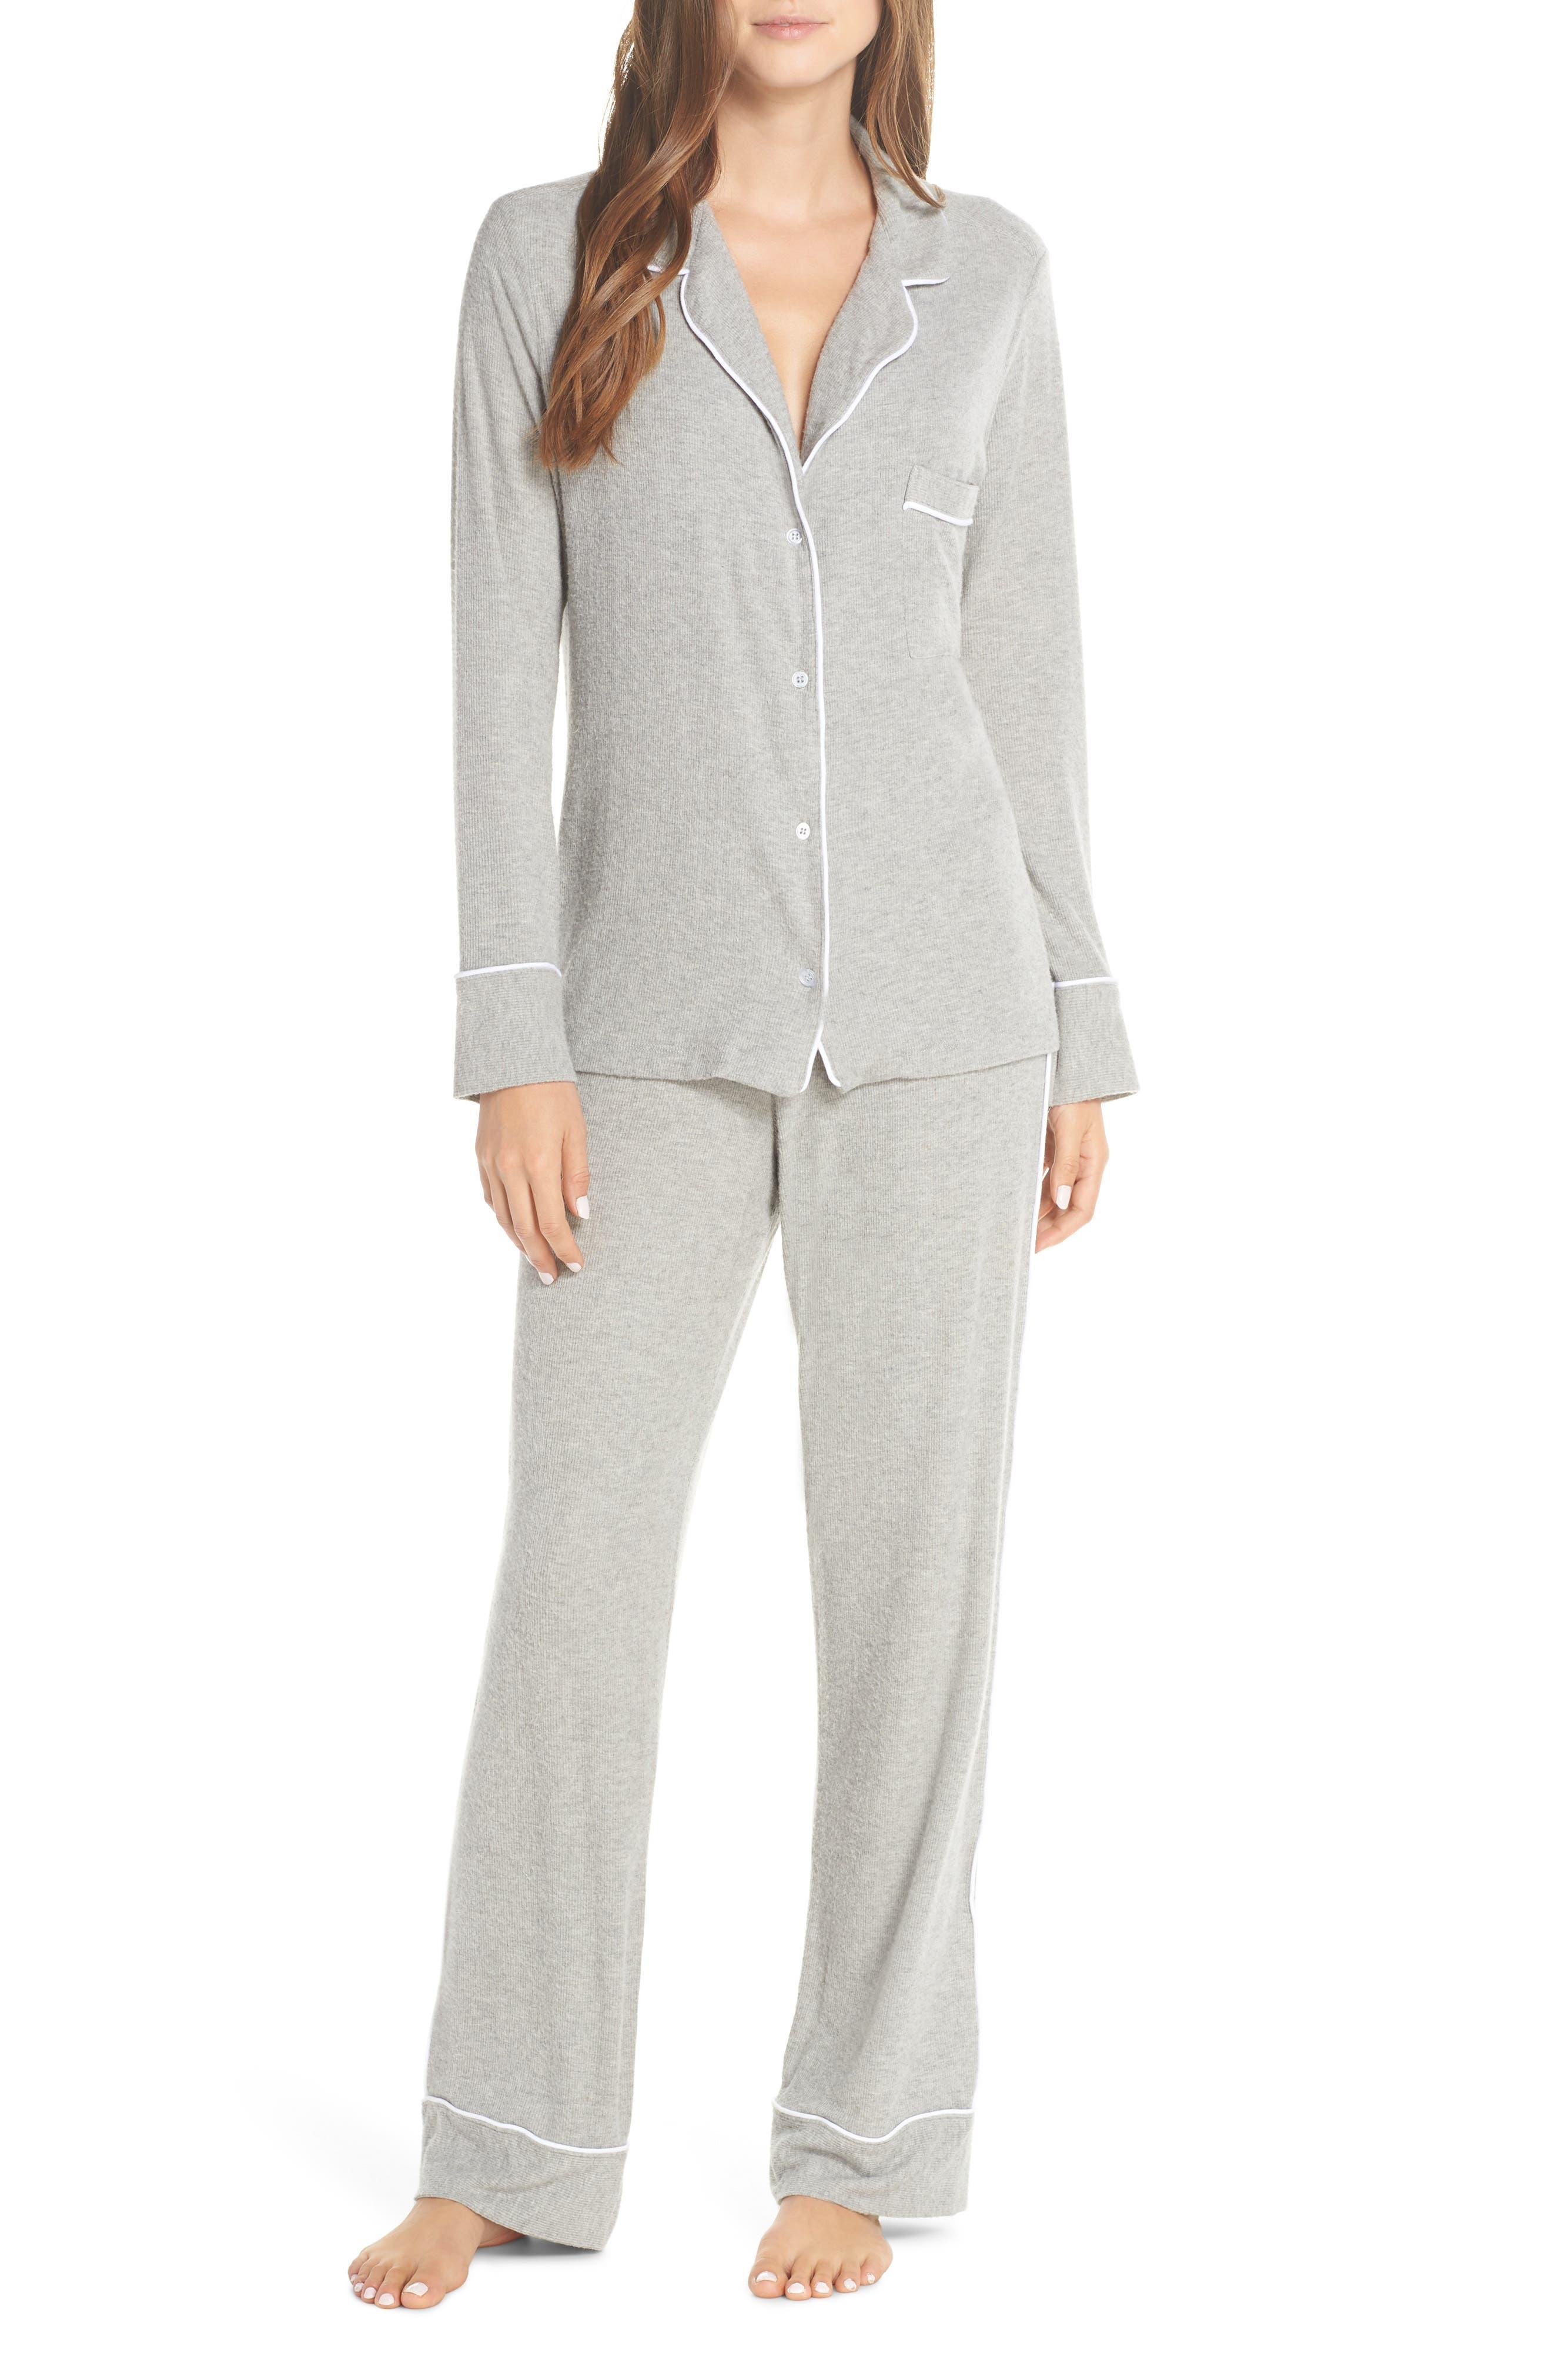 MAISON DU SOIR Monaco Long-Sleeve Pajamas in Heather Grey Rib